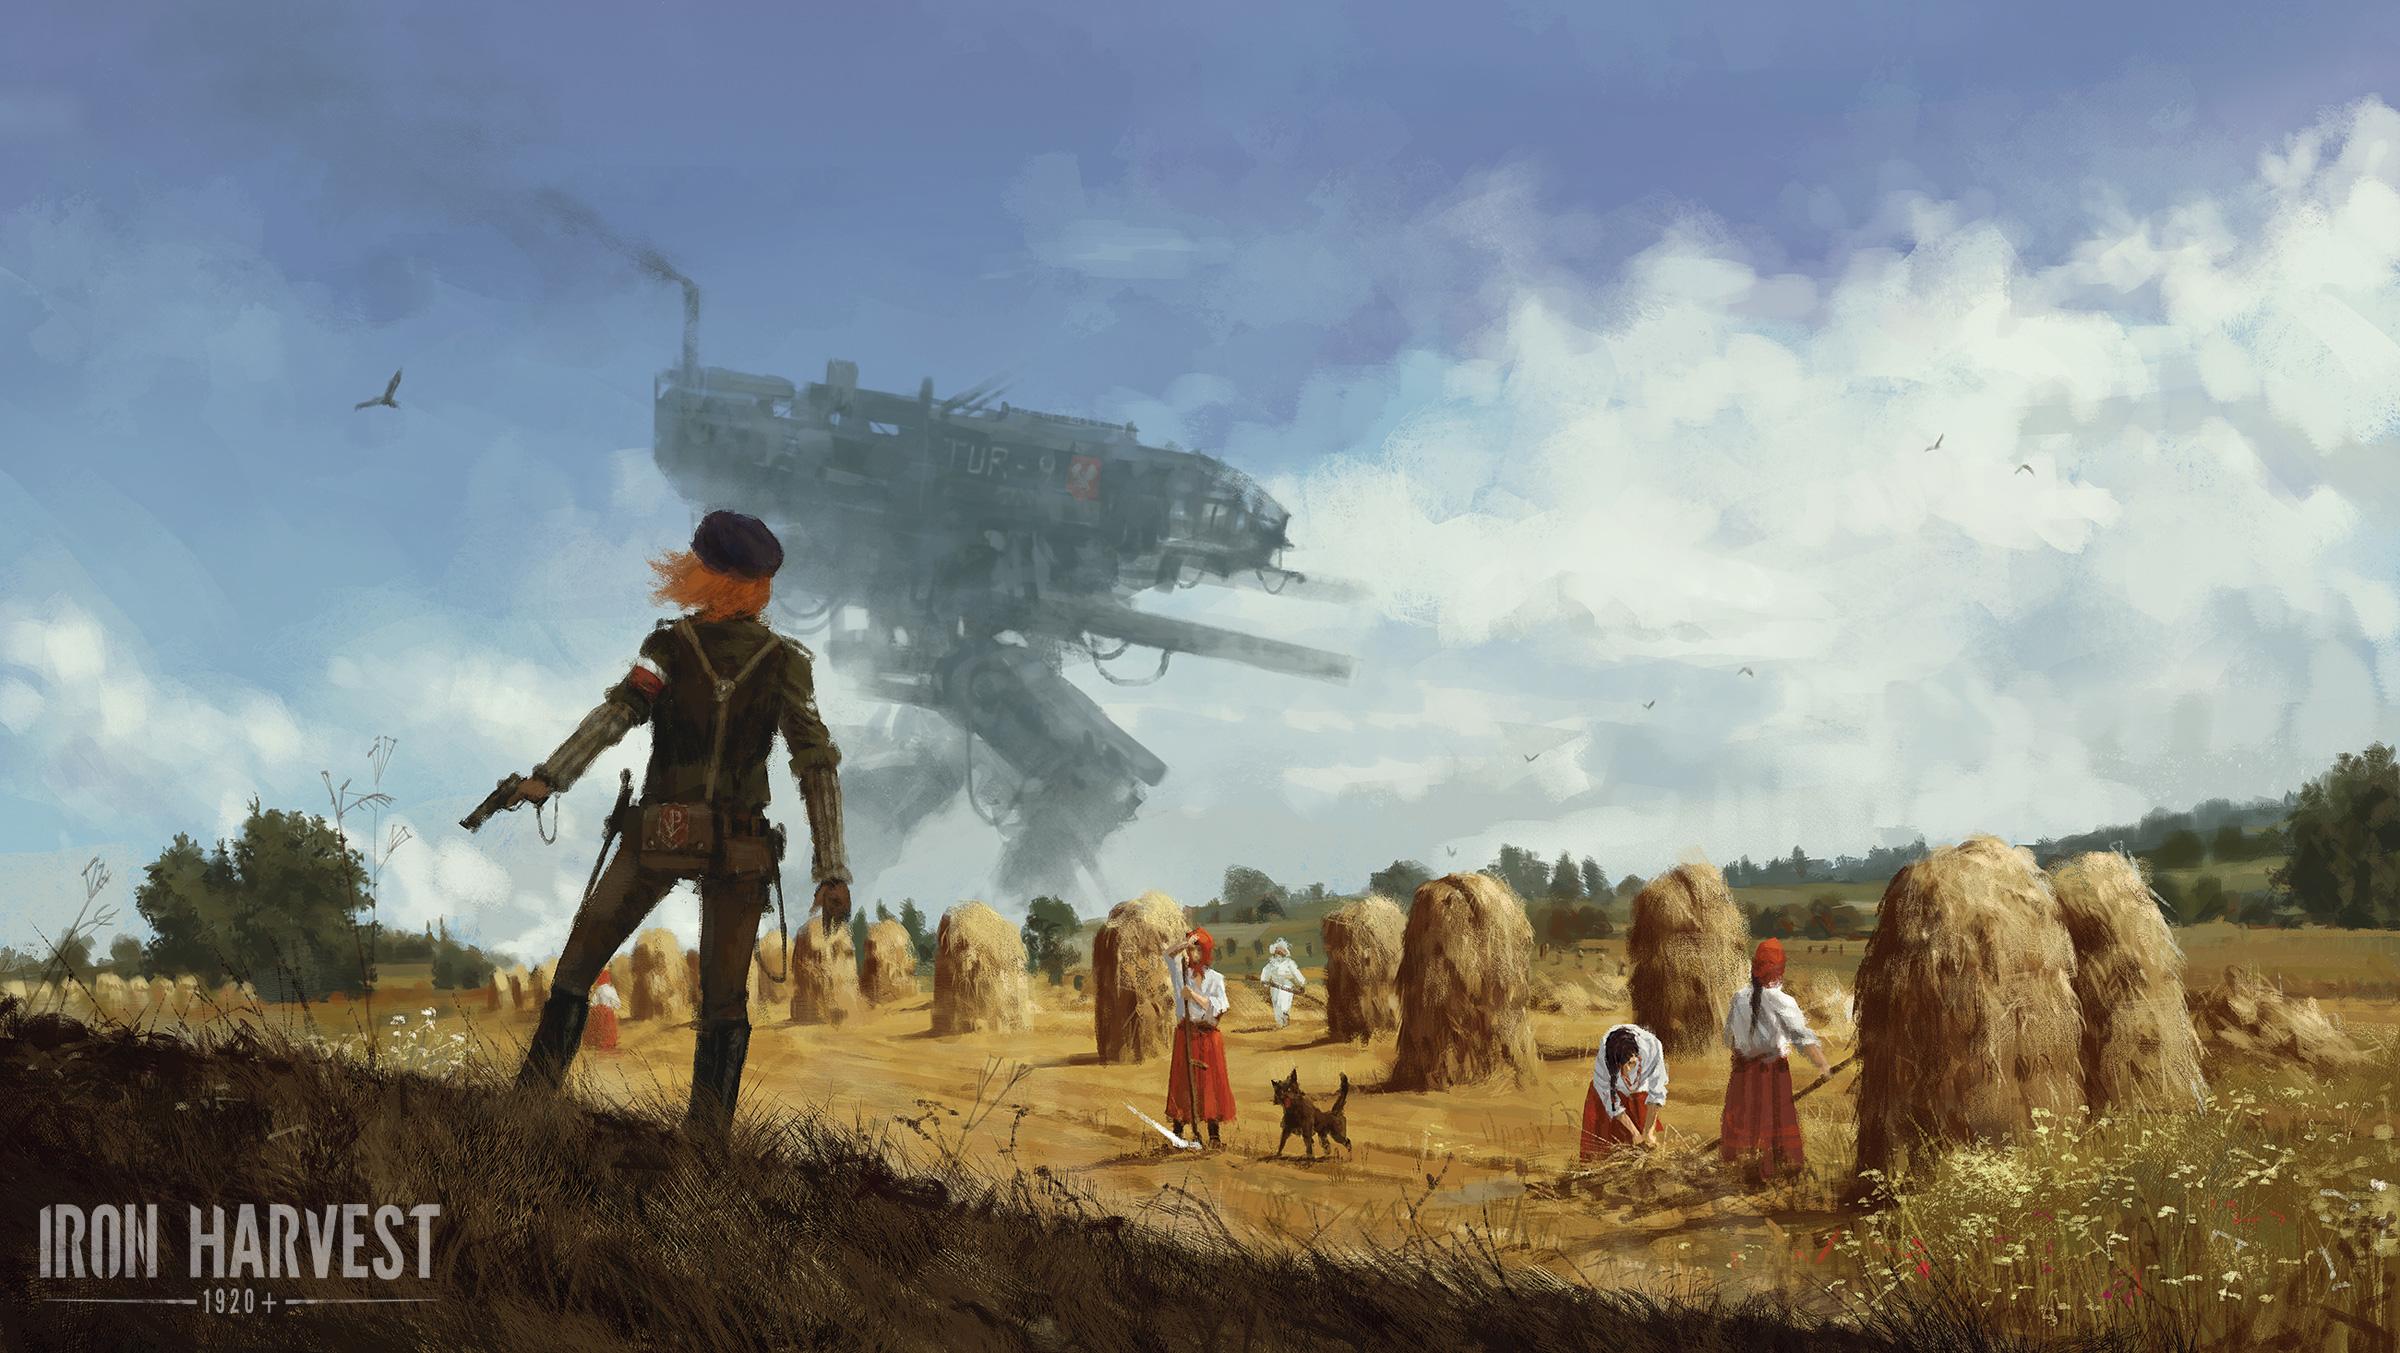 Jakub Różalski<br />Iron Harvest<br />1920+